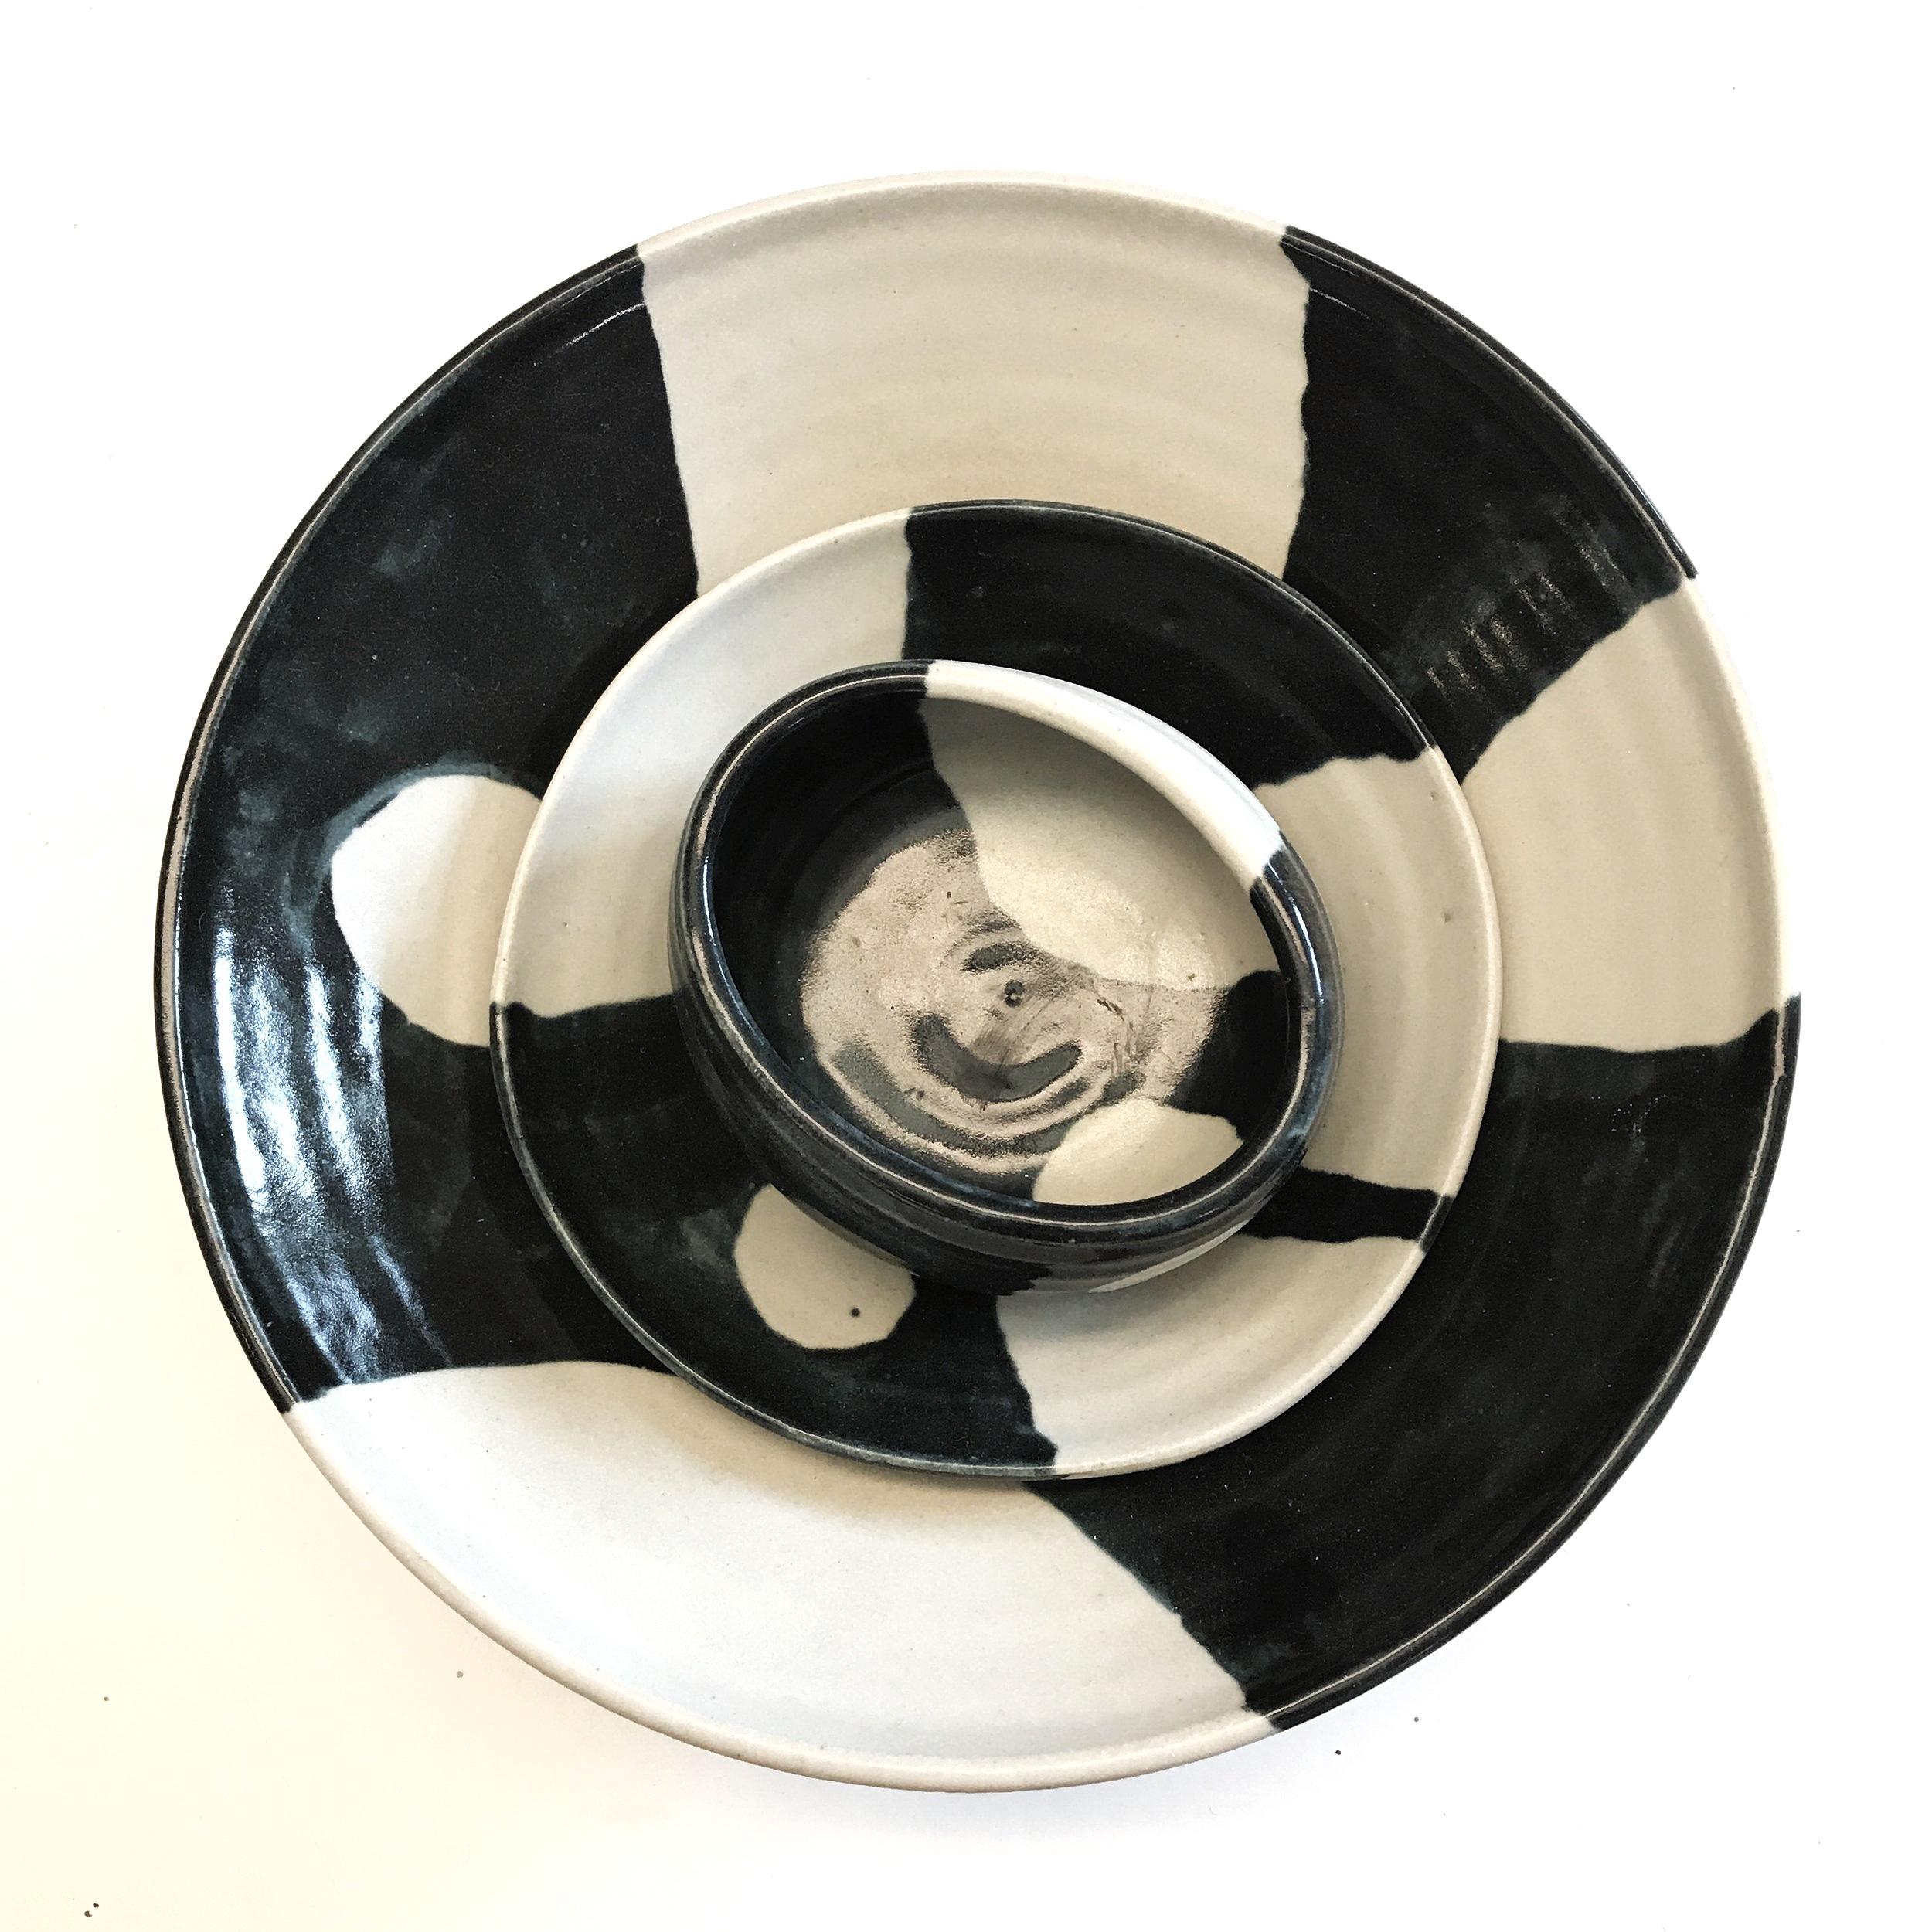 Stoneware bowls small 150mm, medium 180mm and large 320mm diameter